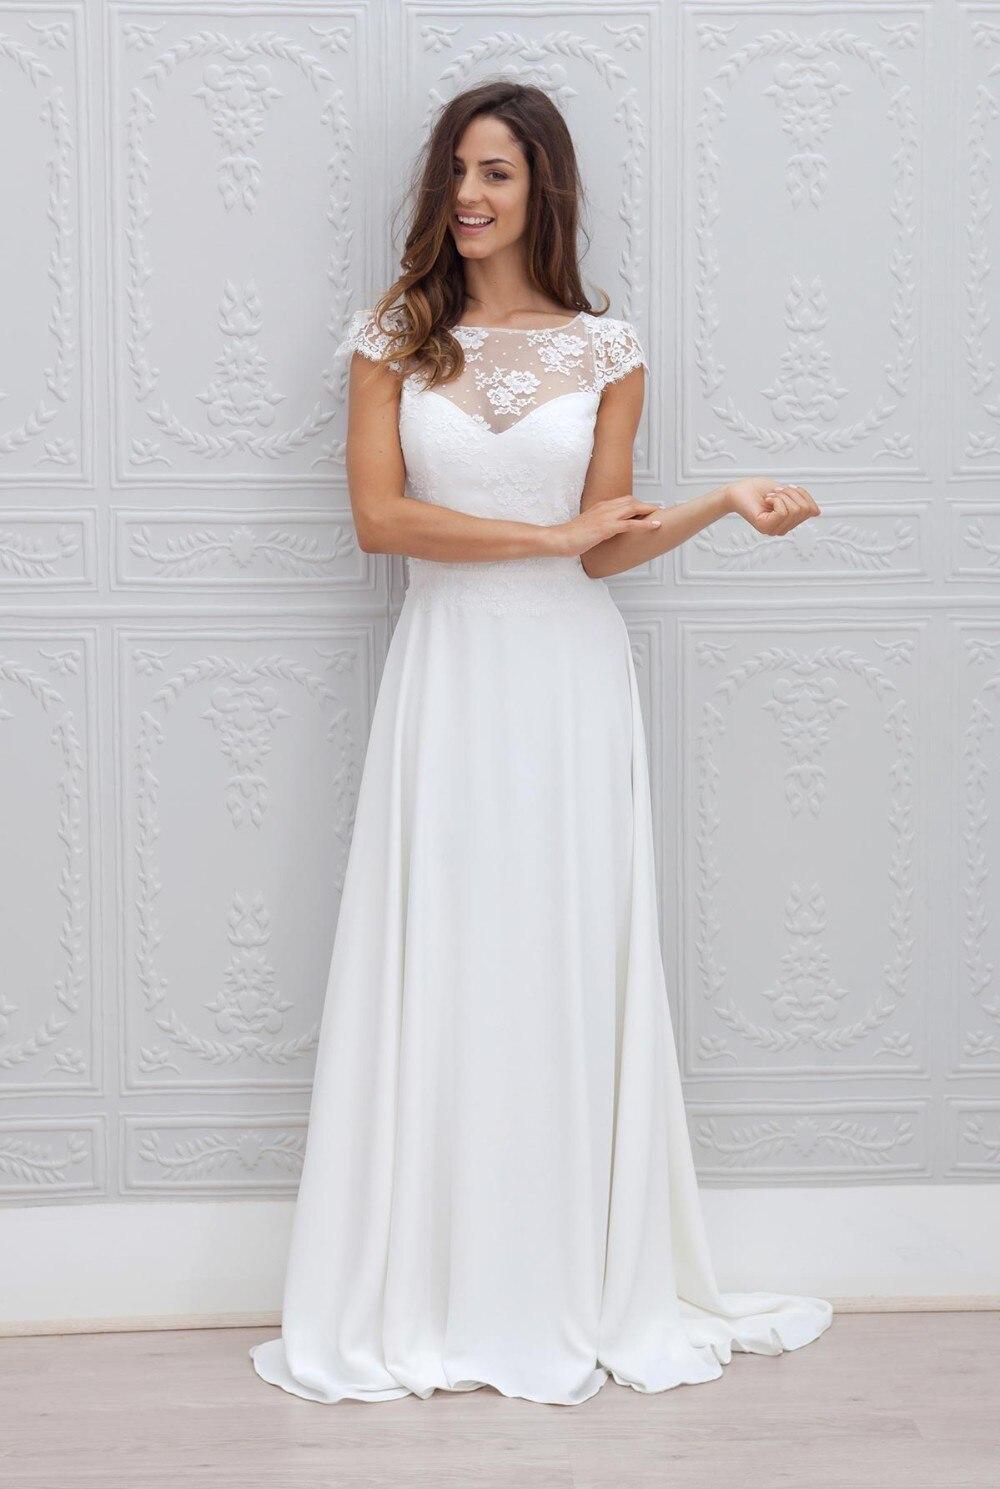 aliexpress wedding dresses Aliexpress com Buy Elegant High Neck Long Sleeve Ball Gown Satin Arabic Islamic Muslim White Wedding Dresses